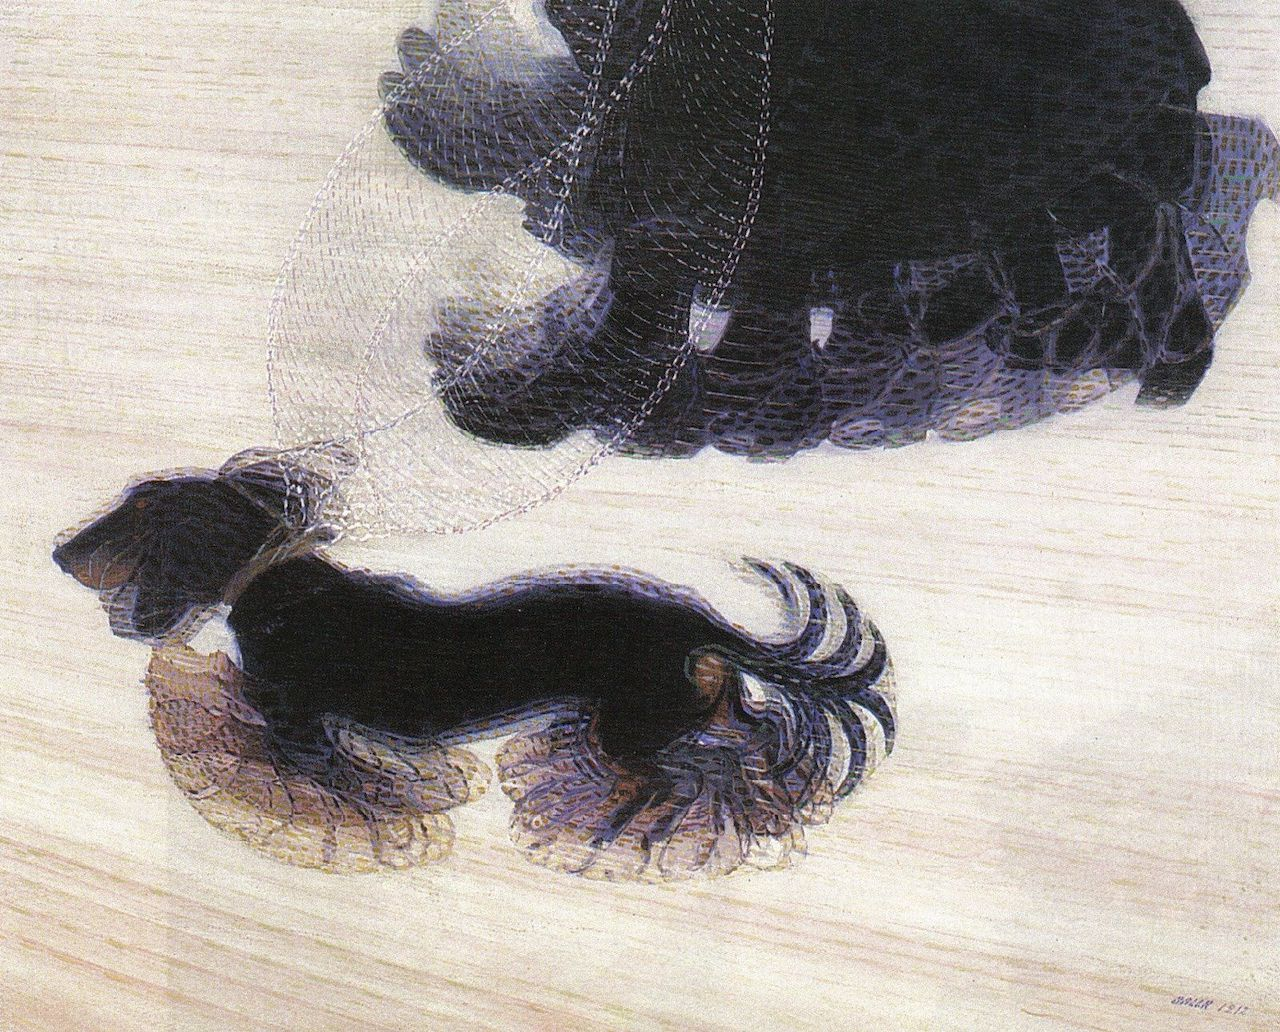 Giacomo Balla. Dynamik eines Hundes an der Leine. 1912. Öl / Leinwand